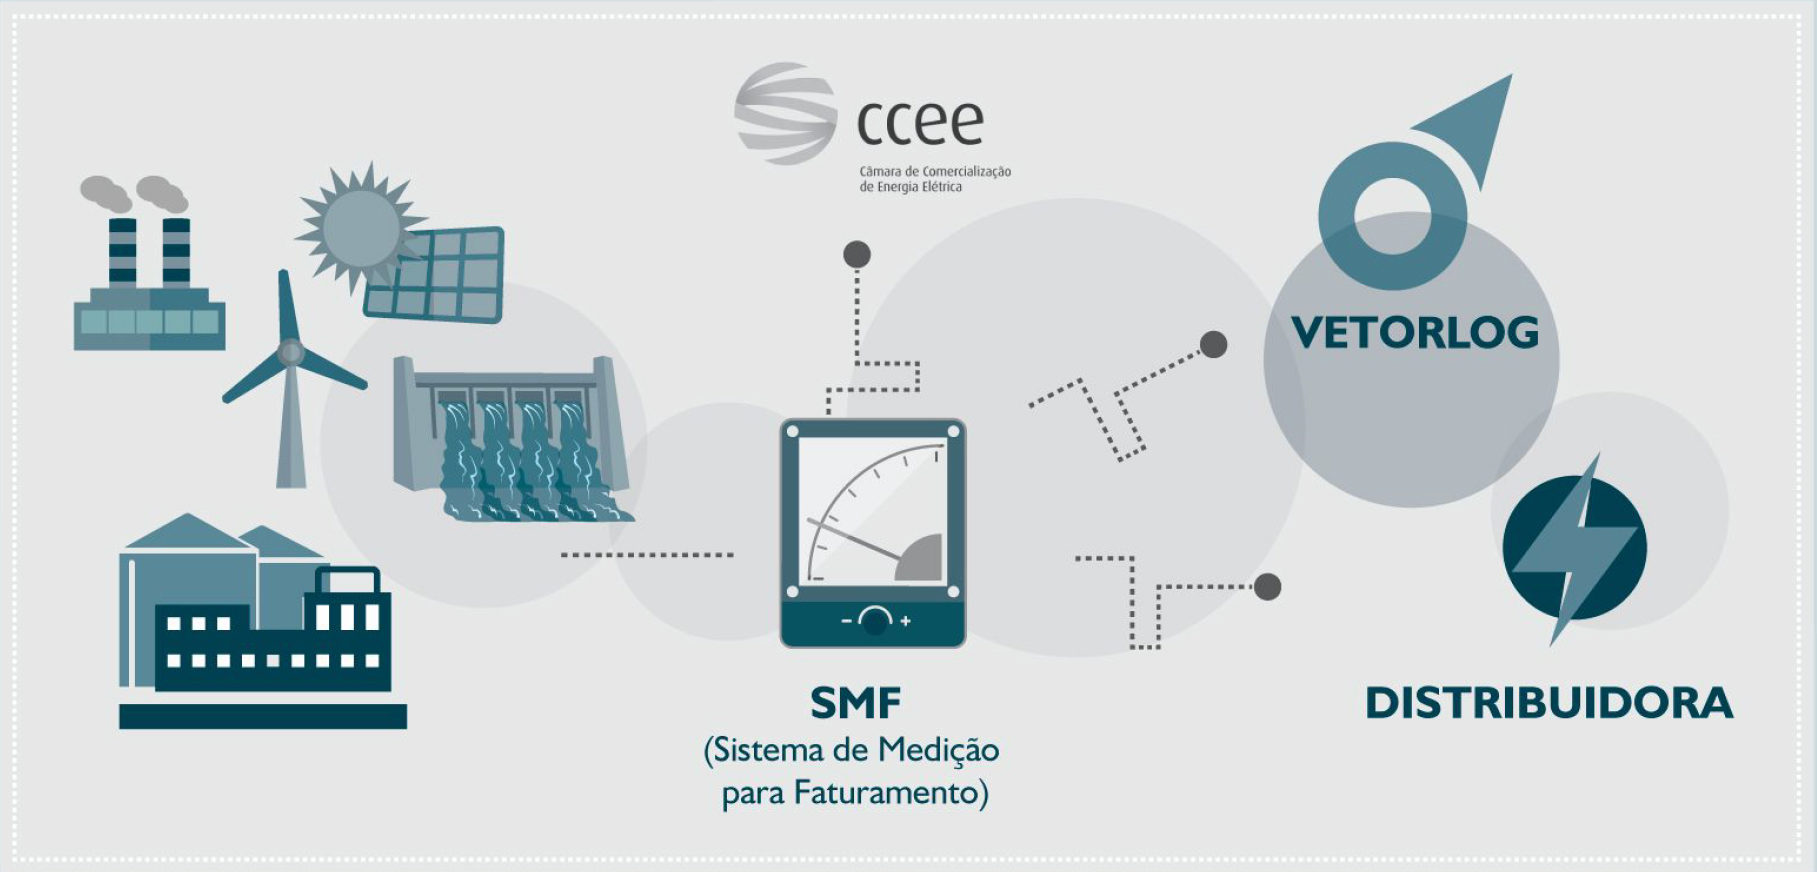 https://www.vetorlog.com/wp-content/uploads/2016/11/sistema-SCDE-1817x872.jpg